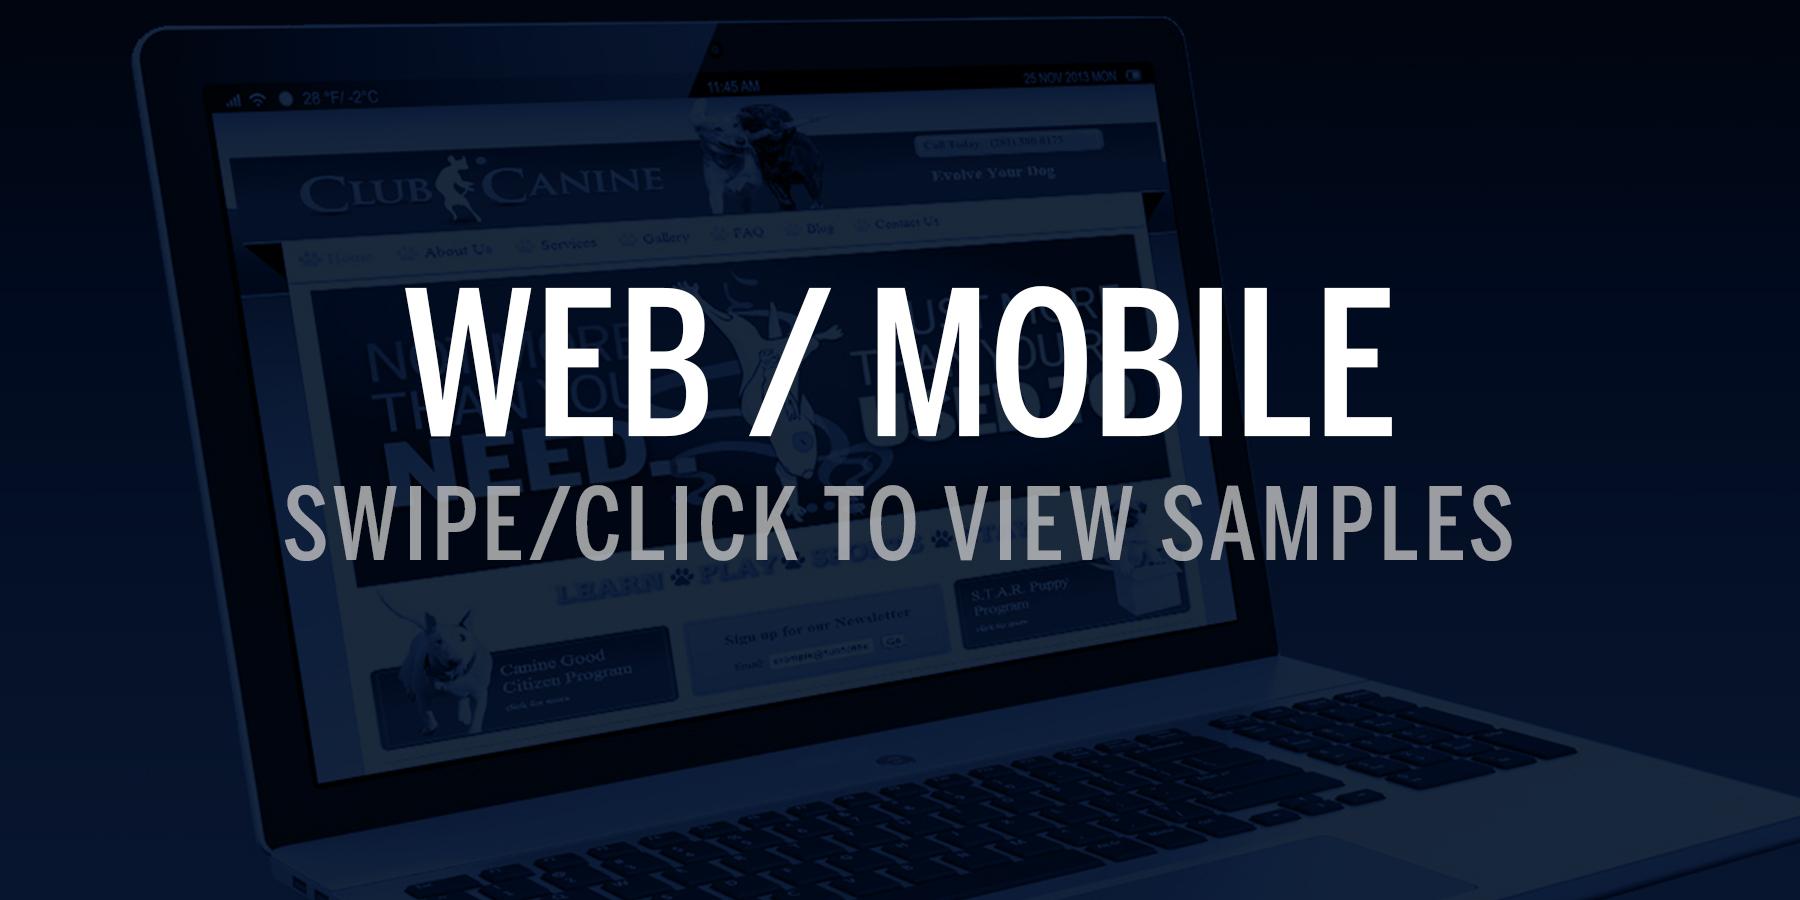 webmobile